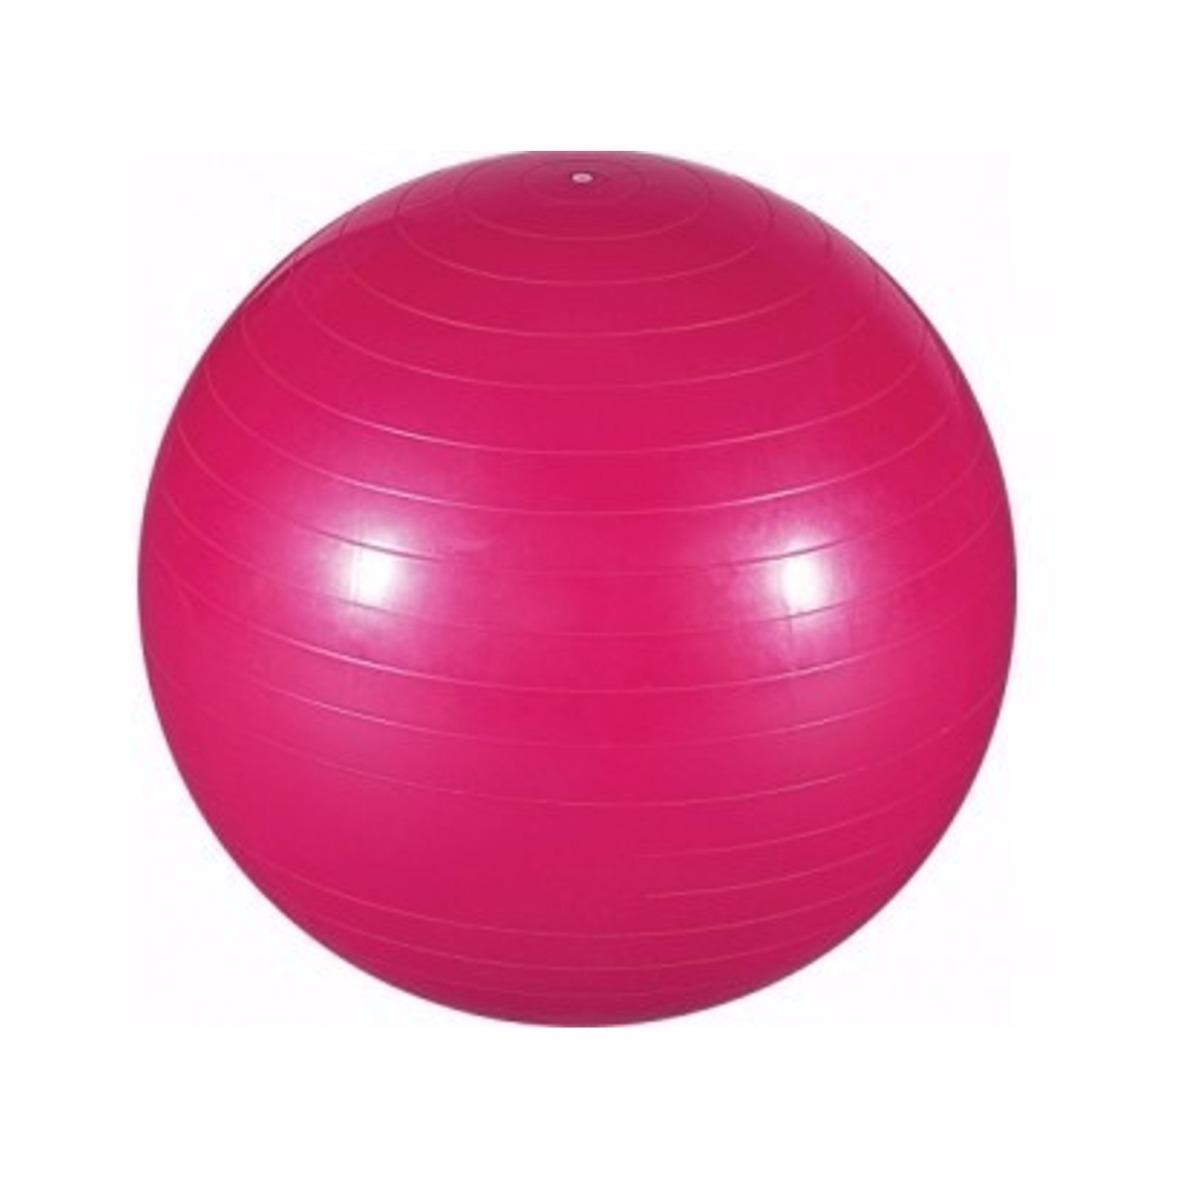 Bola Suiça Pilates Fisioterapia Fitness Yoga Rosa C  Bomba! - R  42 ... b05d9654851a6